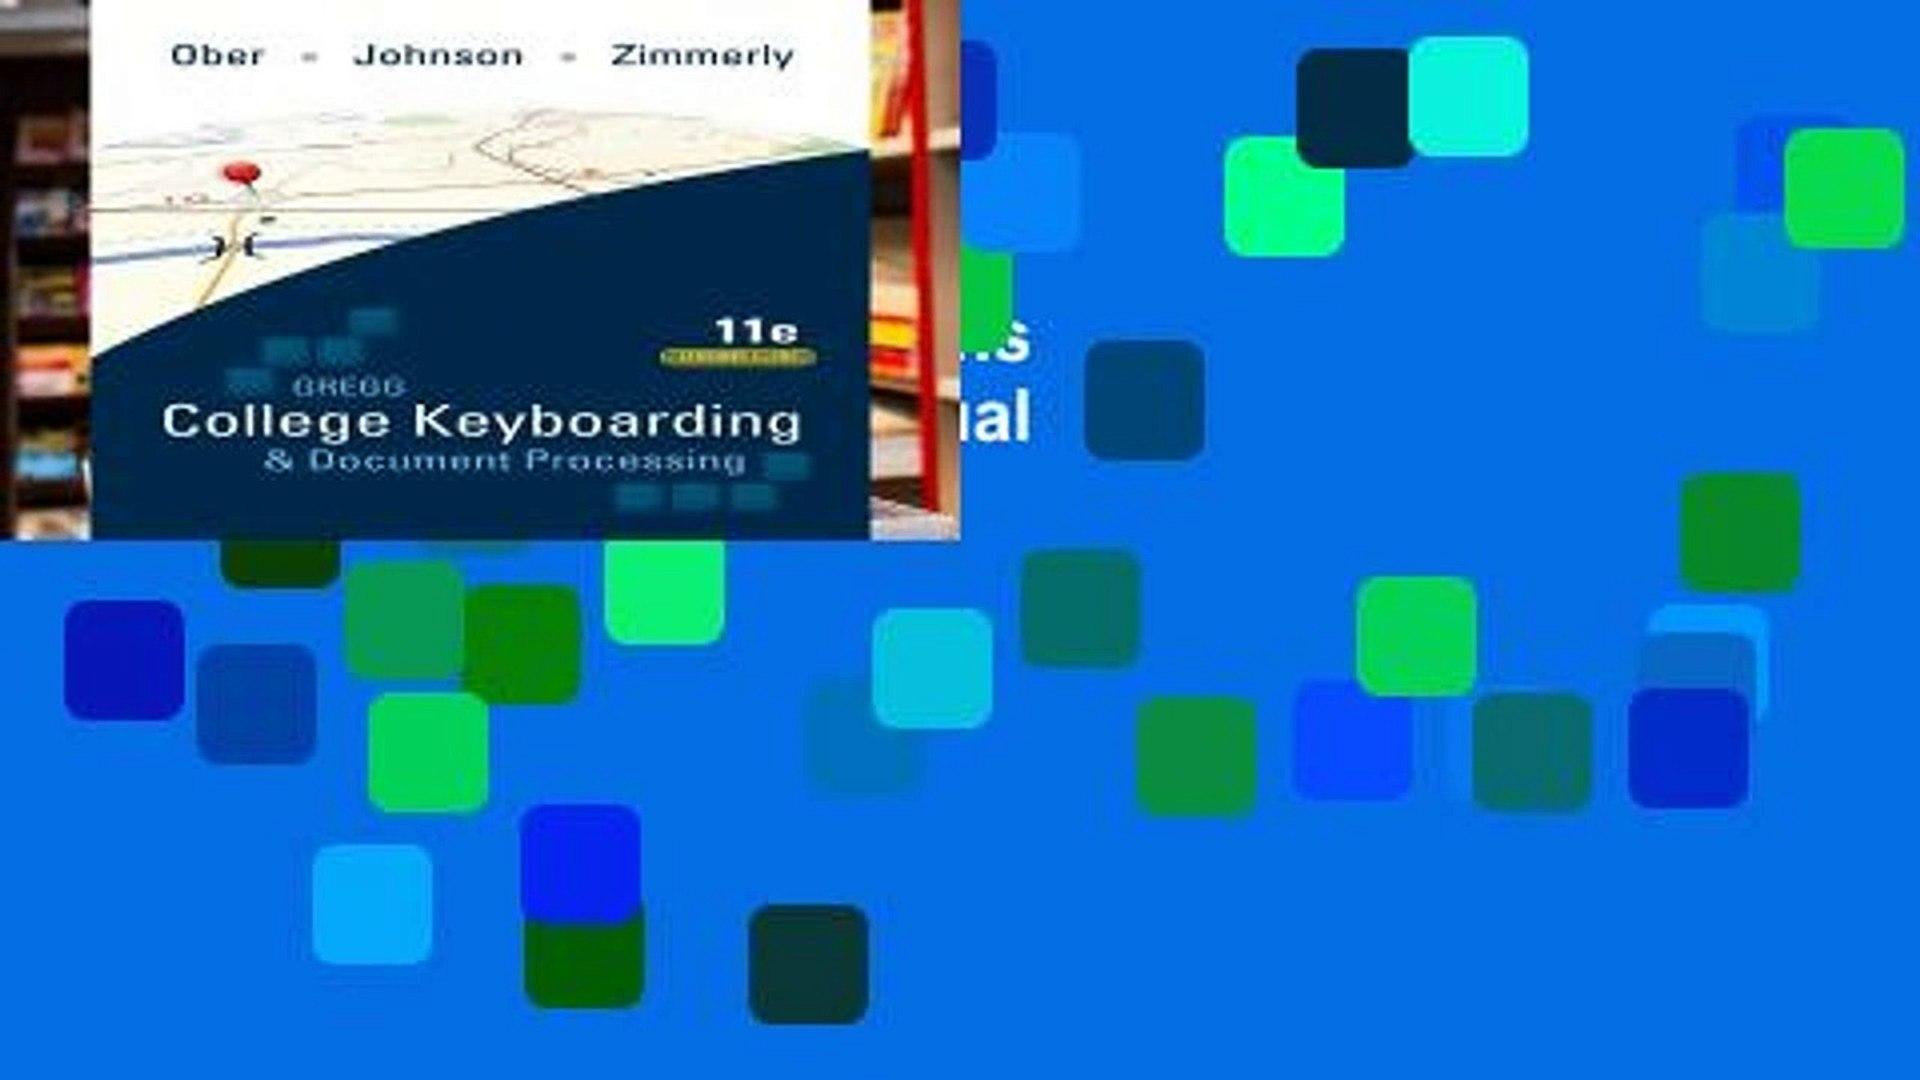 Ebook Ober: Kit 3: (Lessons 1-120) W/ Word 2013 Manual Full